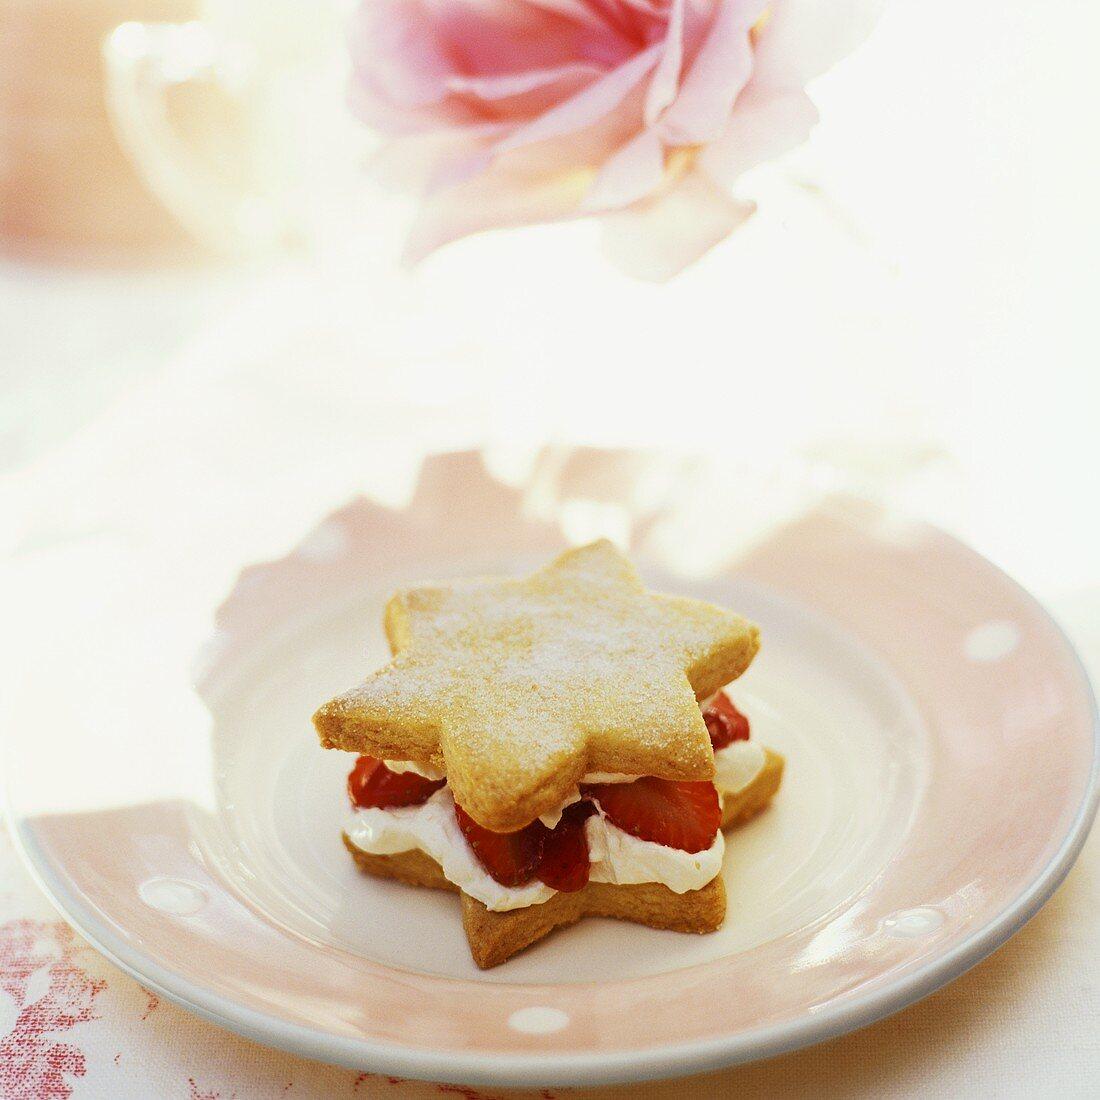 Individual star-shaped strawberry shortcake